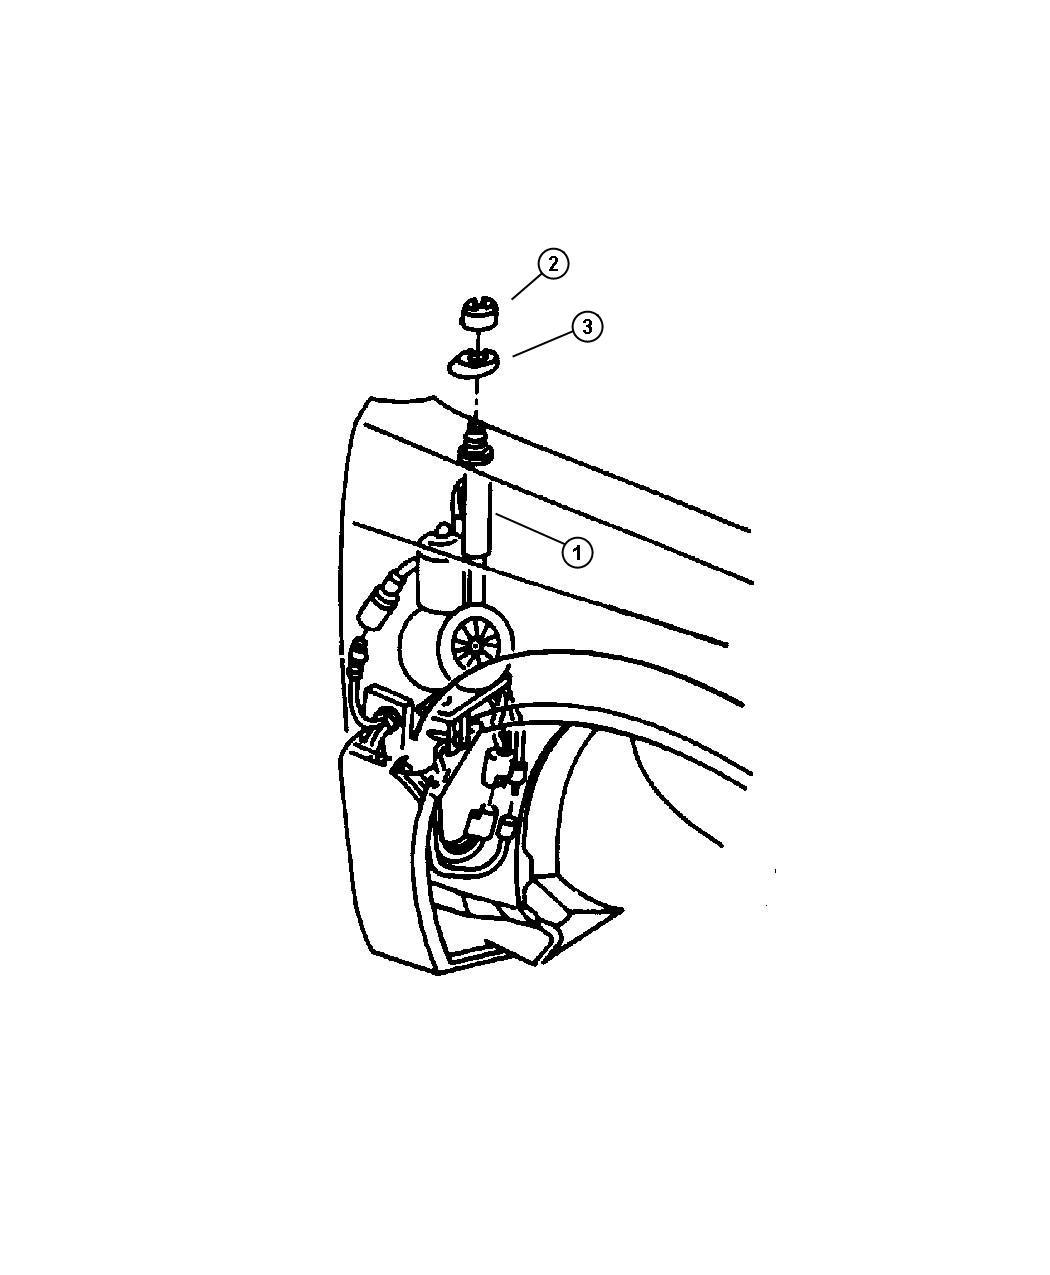 Chrysler Sebring Mast. Power antenna replacement